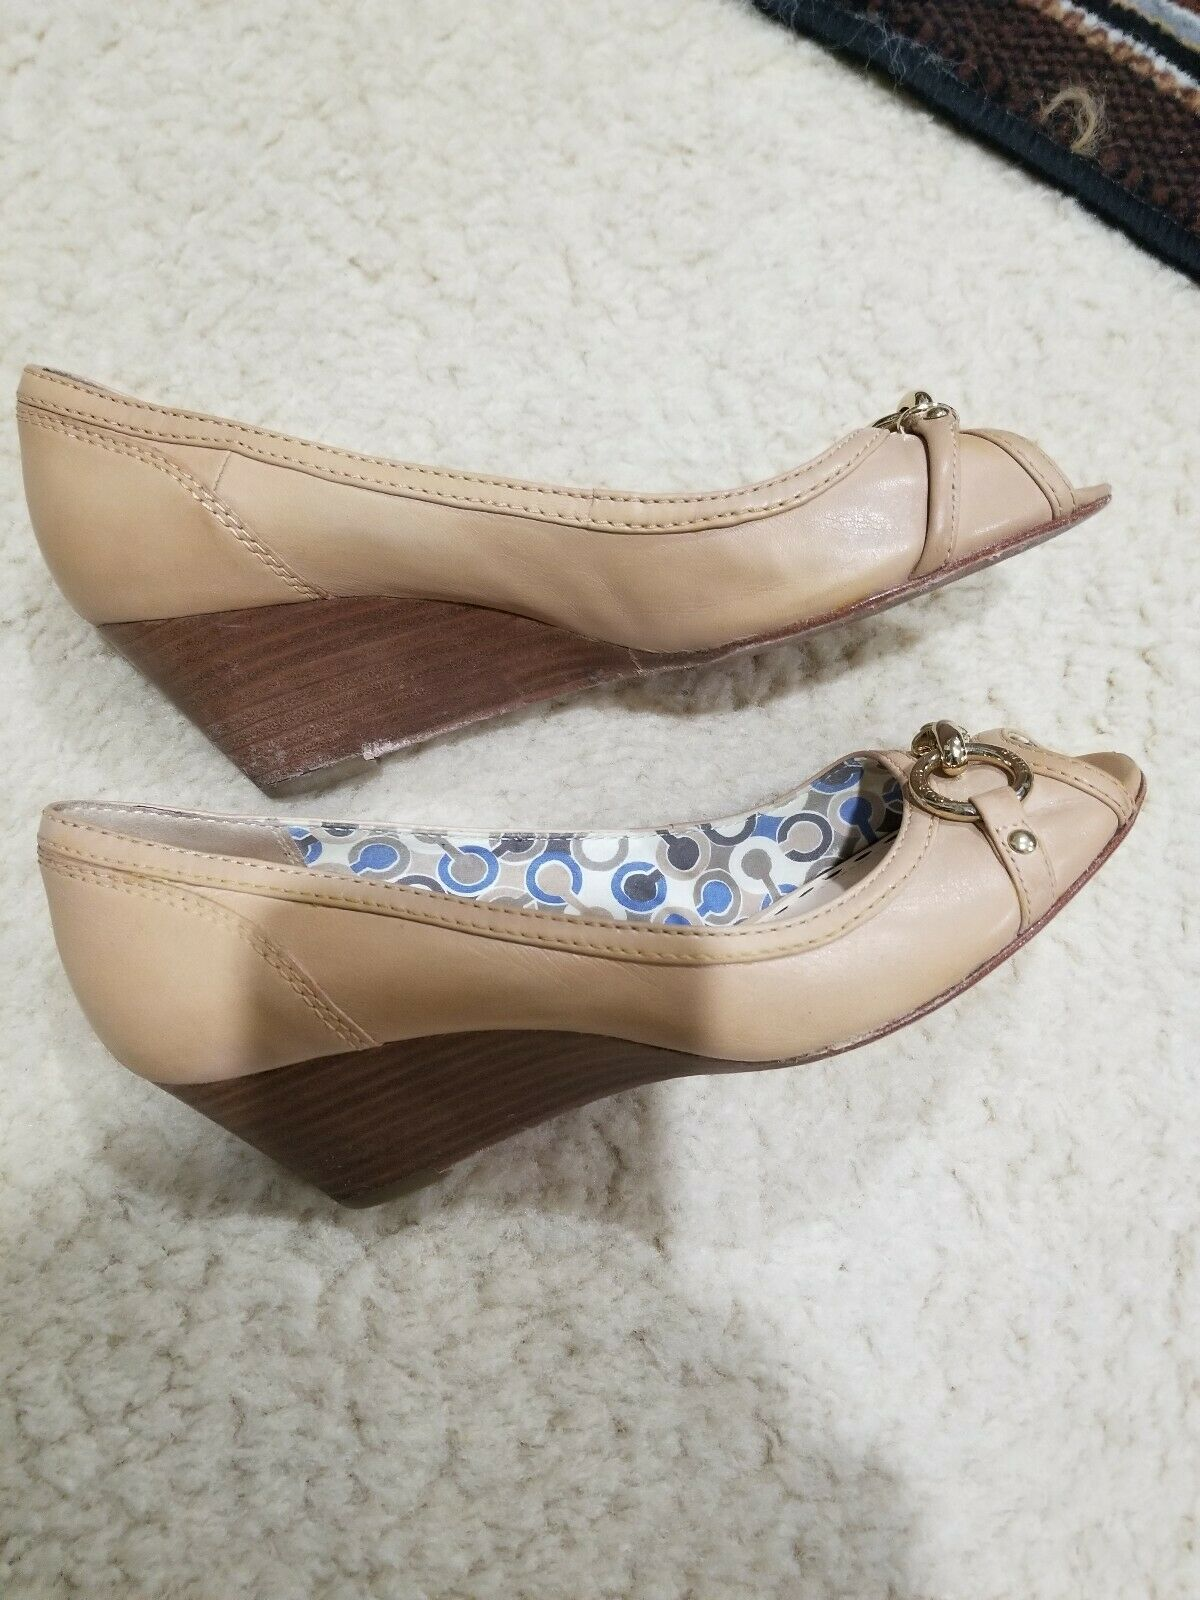 1b5459e46a COACH Stella Leather Open Toe Wedge Shoes Heels Pump Women's SZ ...